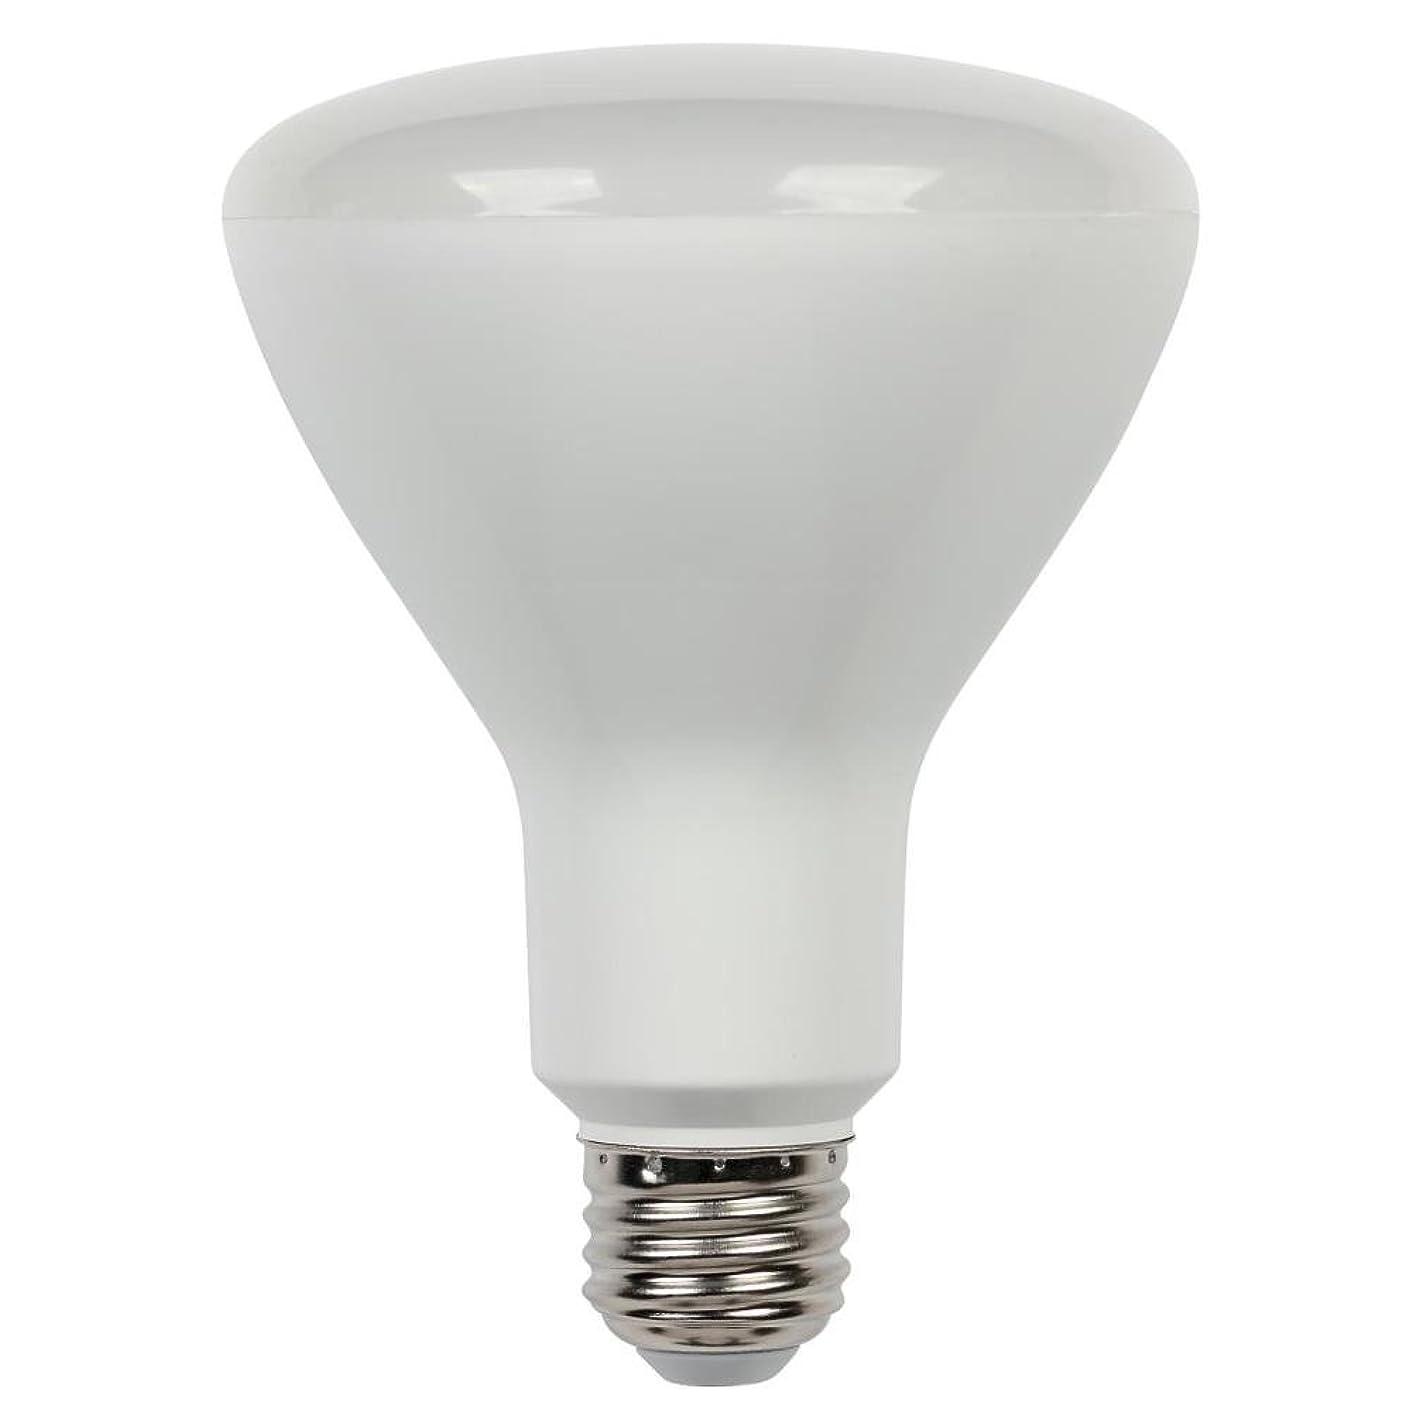 Westinghouse Lighting 5300000 65W Equivalent R30 Flood Dimmable Soft White LED Energy Star Light Bulb with Medium Base